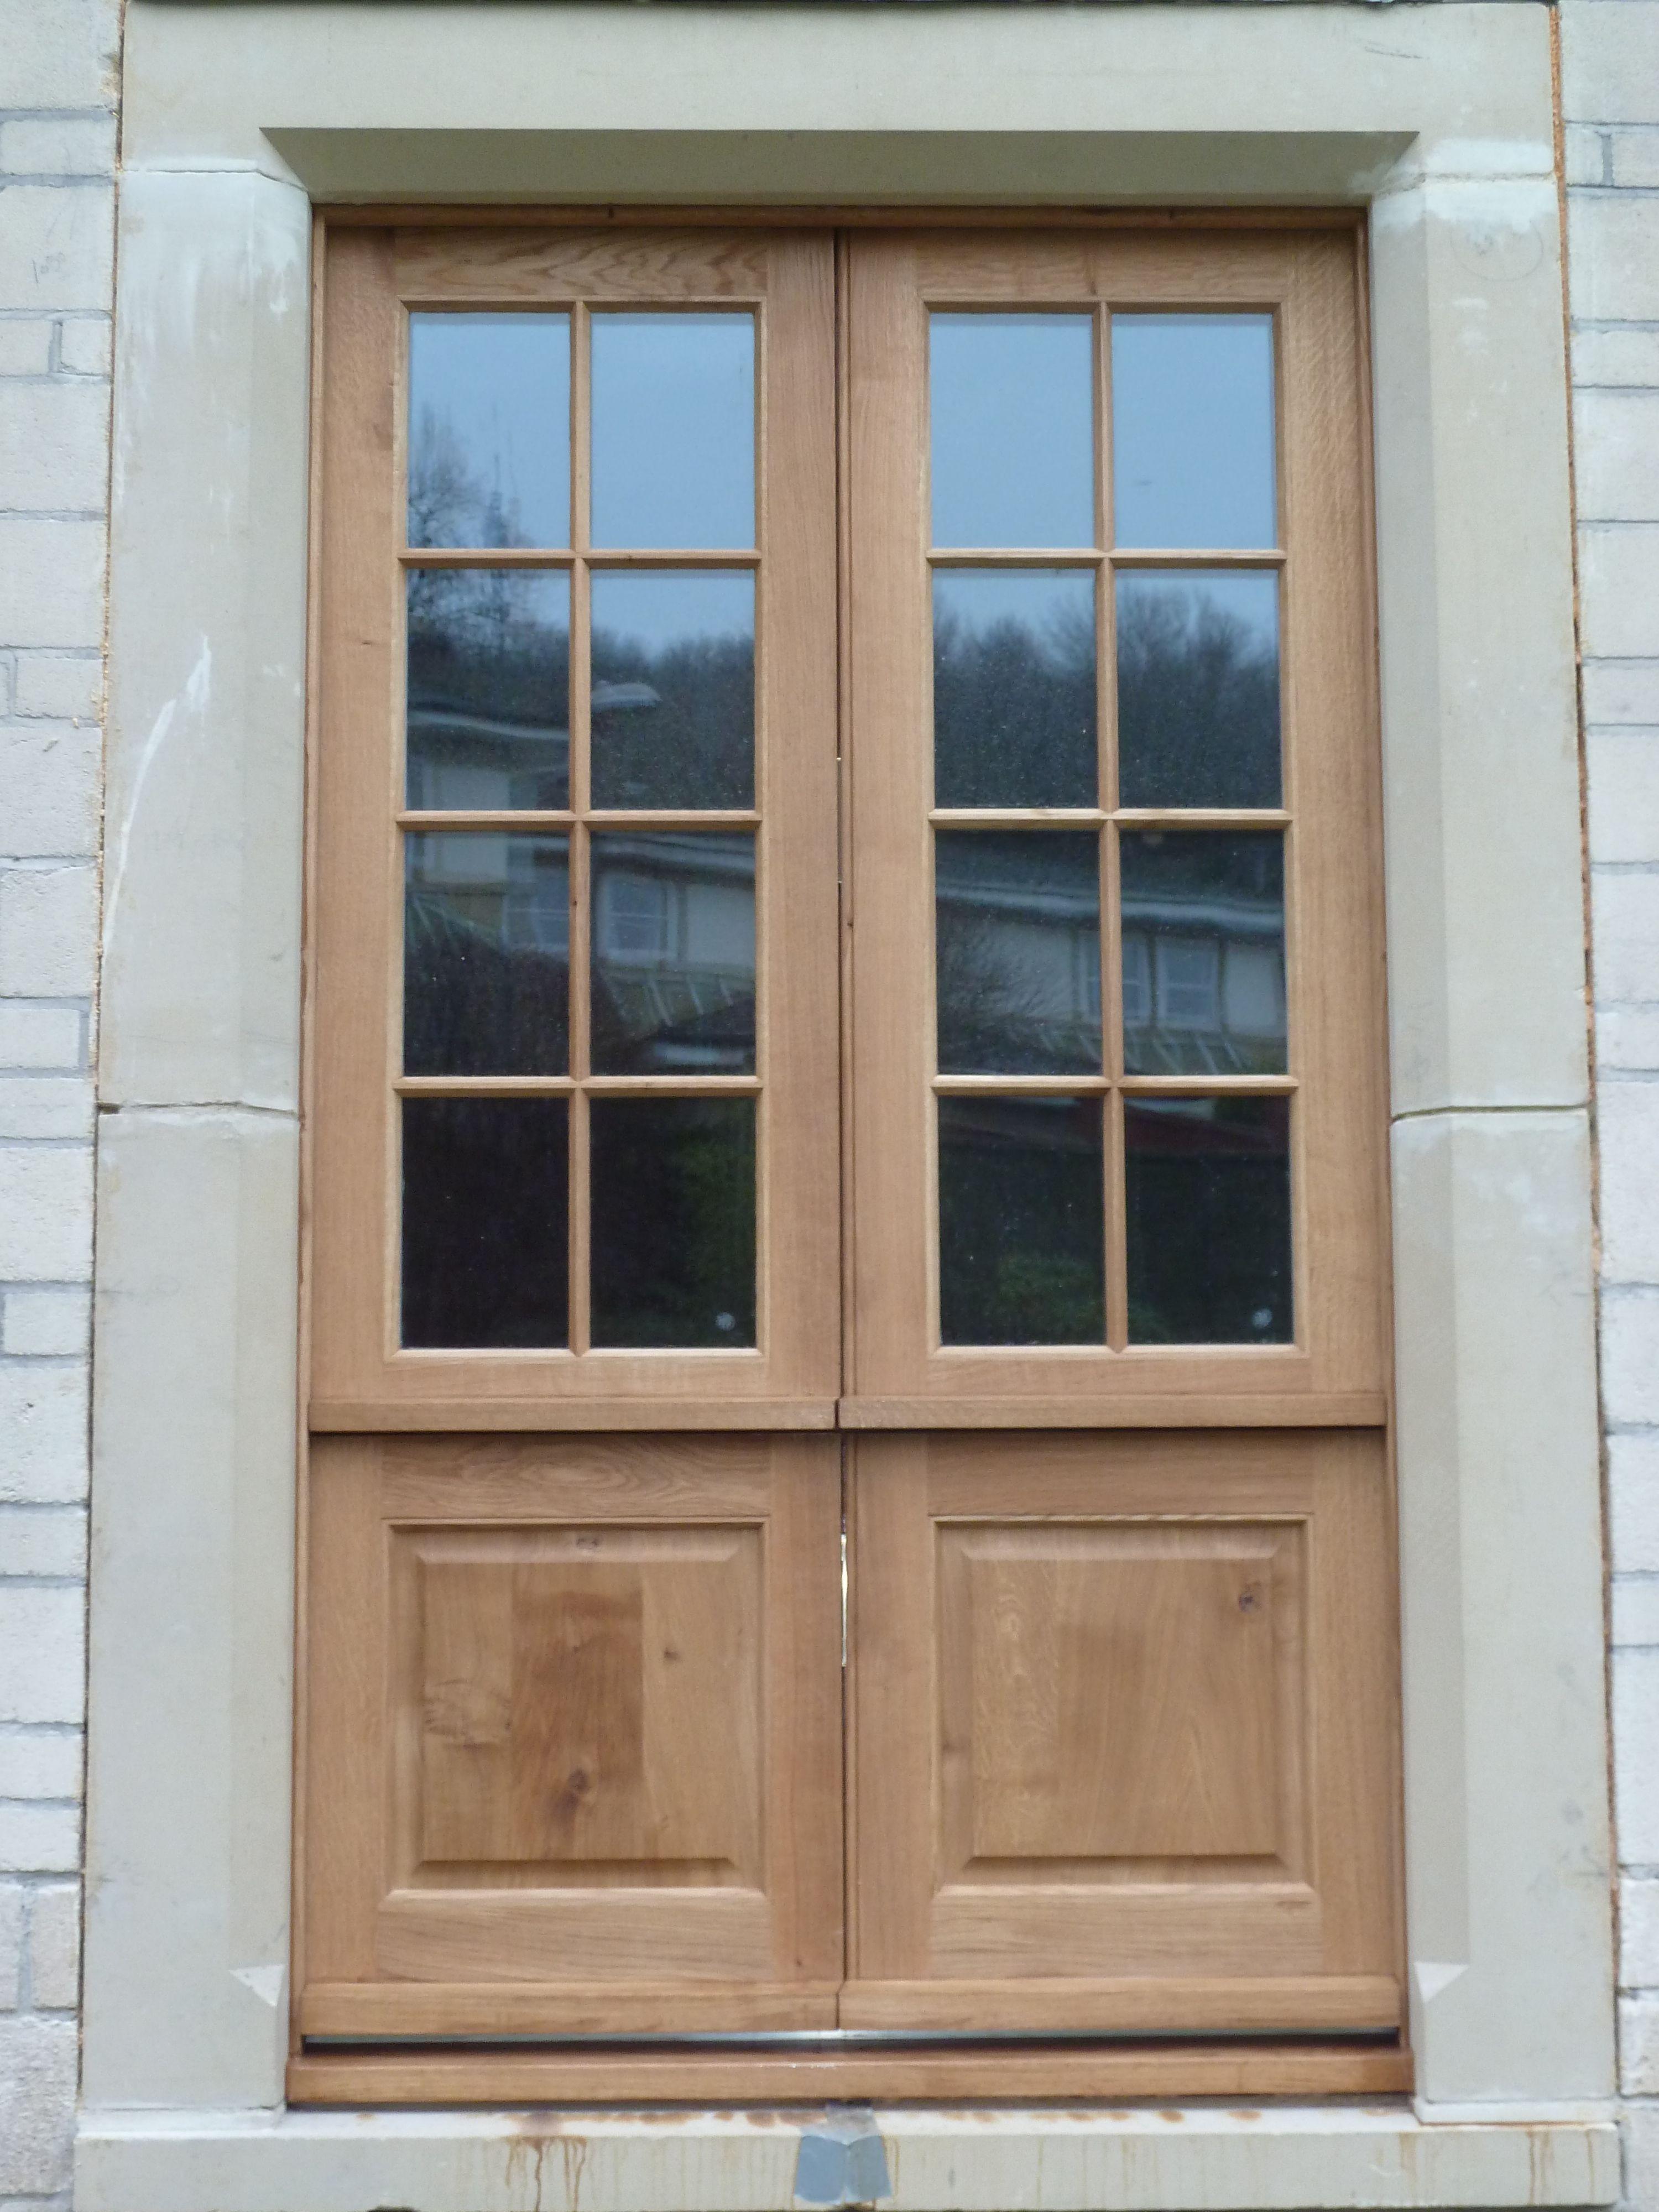 Oak Double Stable Doors Double Glazed Made By K Pitman Joinery